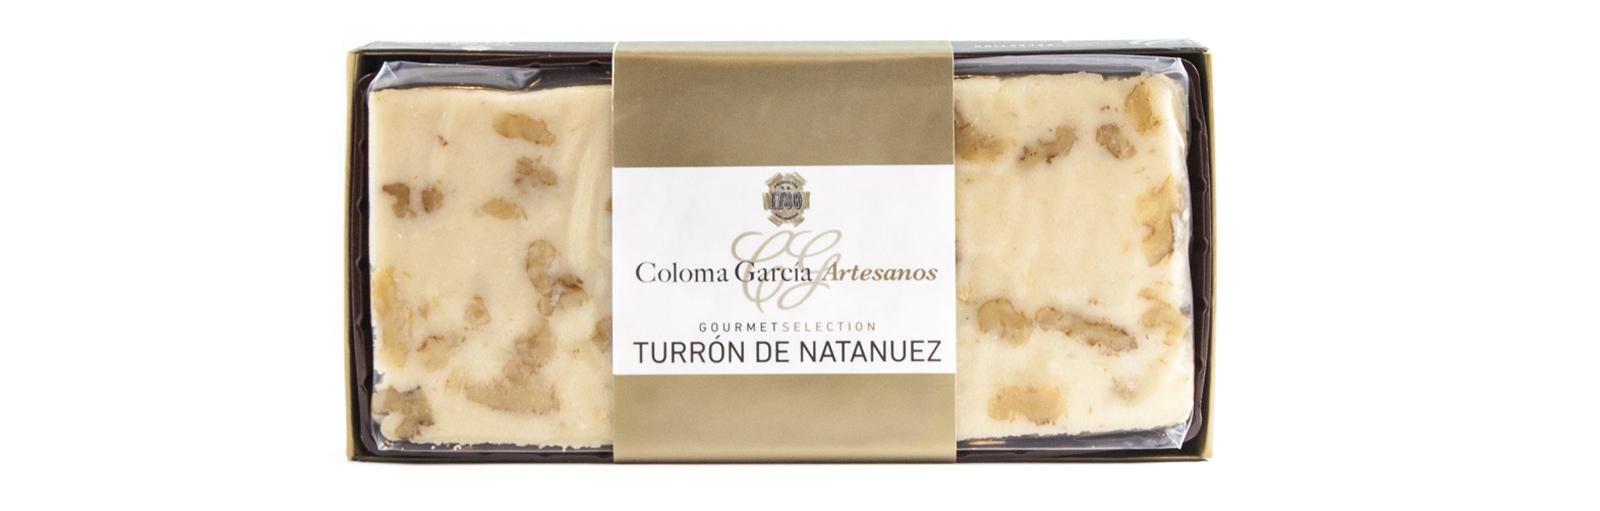 TURRÓN DE NATANUEZ